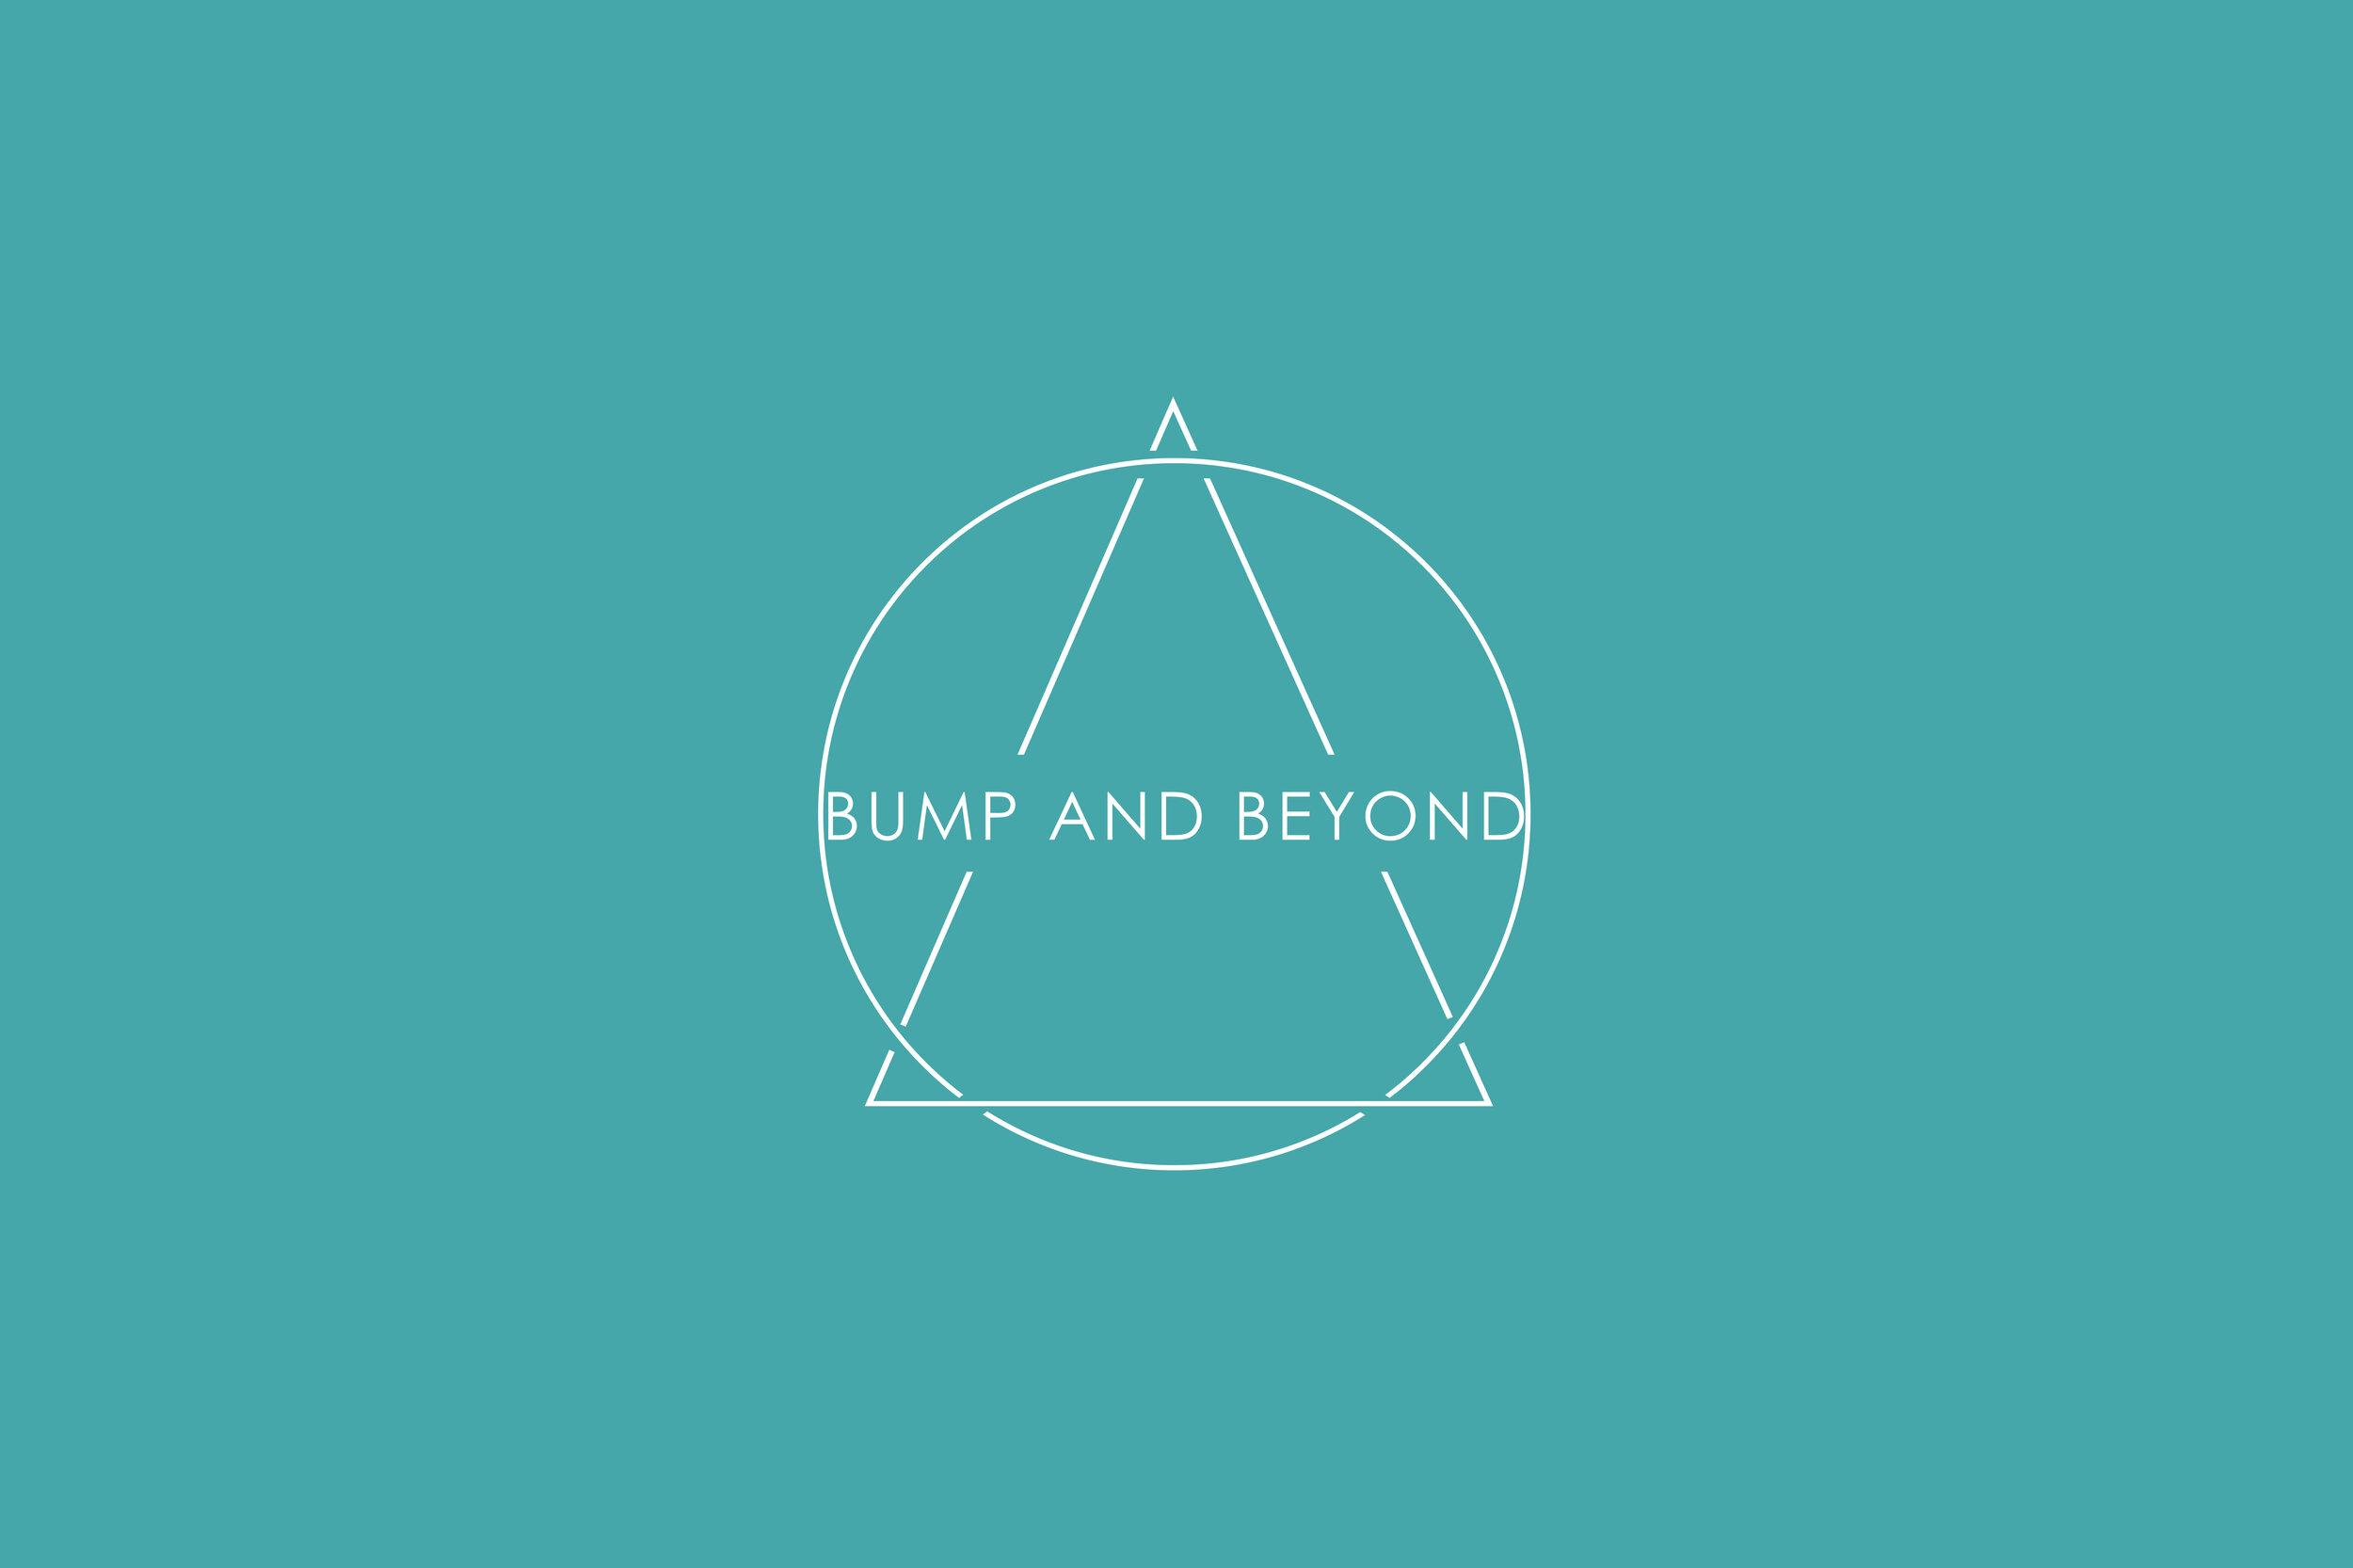 bump and beyond logo blue background3.jpg